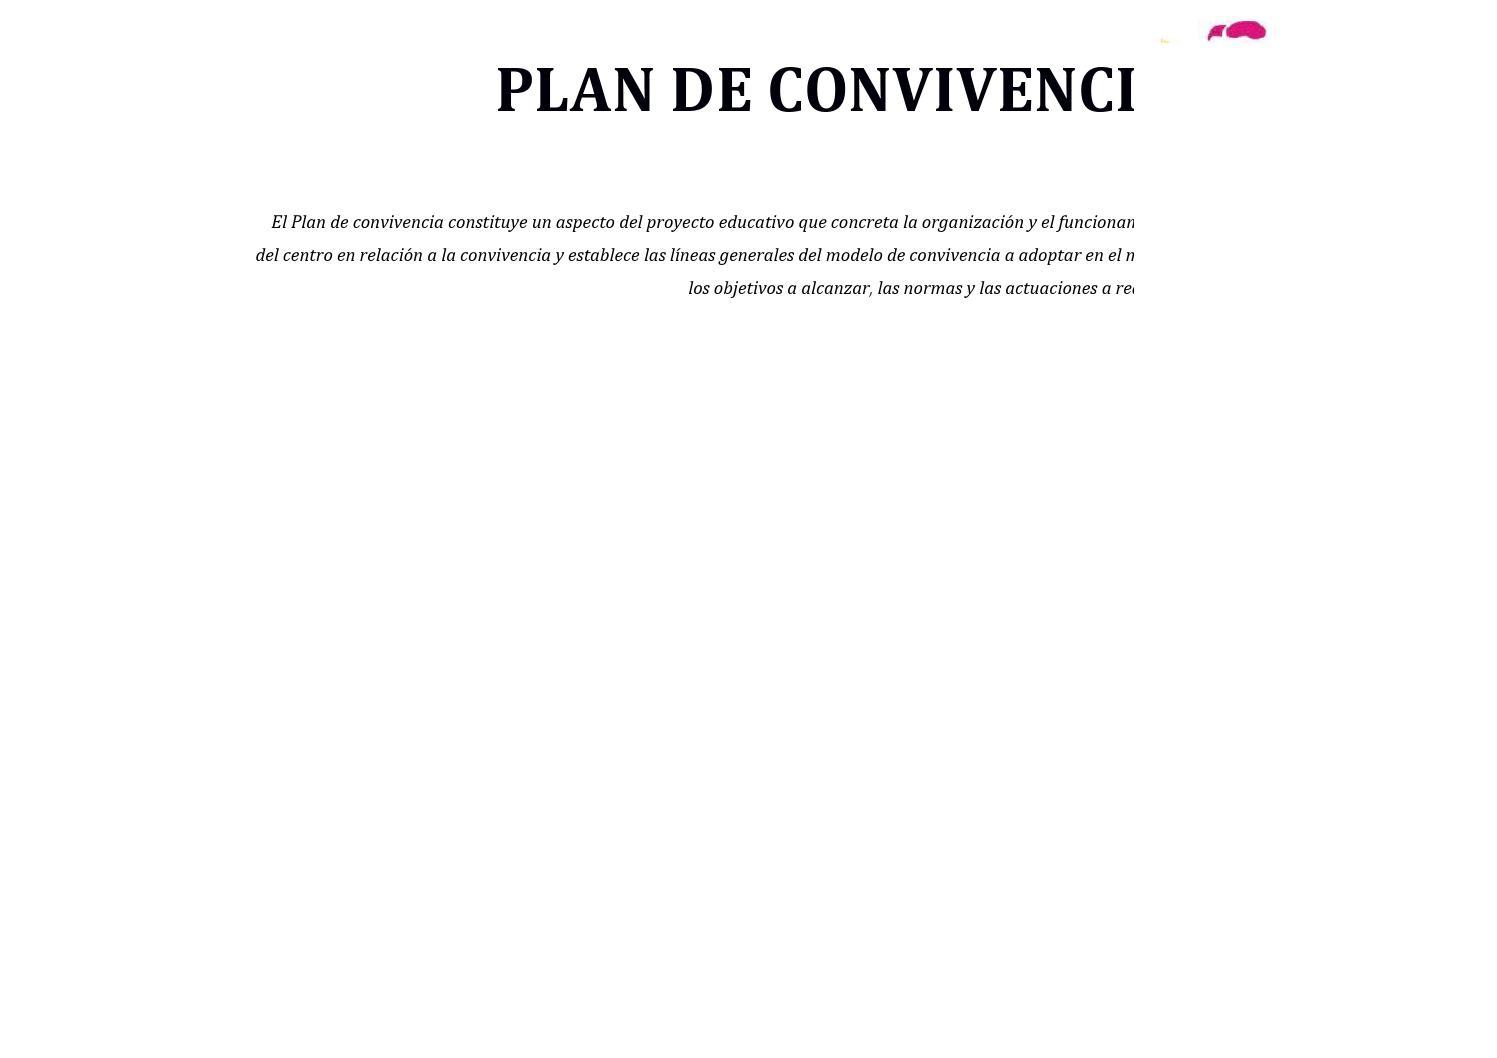 Plan de convivencia by Ies Laguna de Tollón - issuu